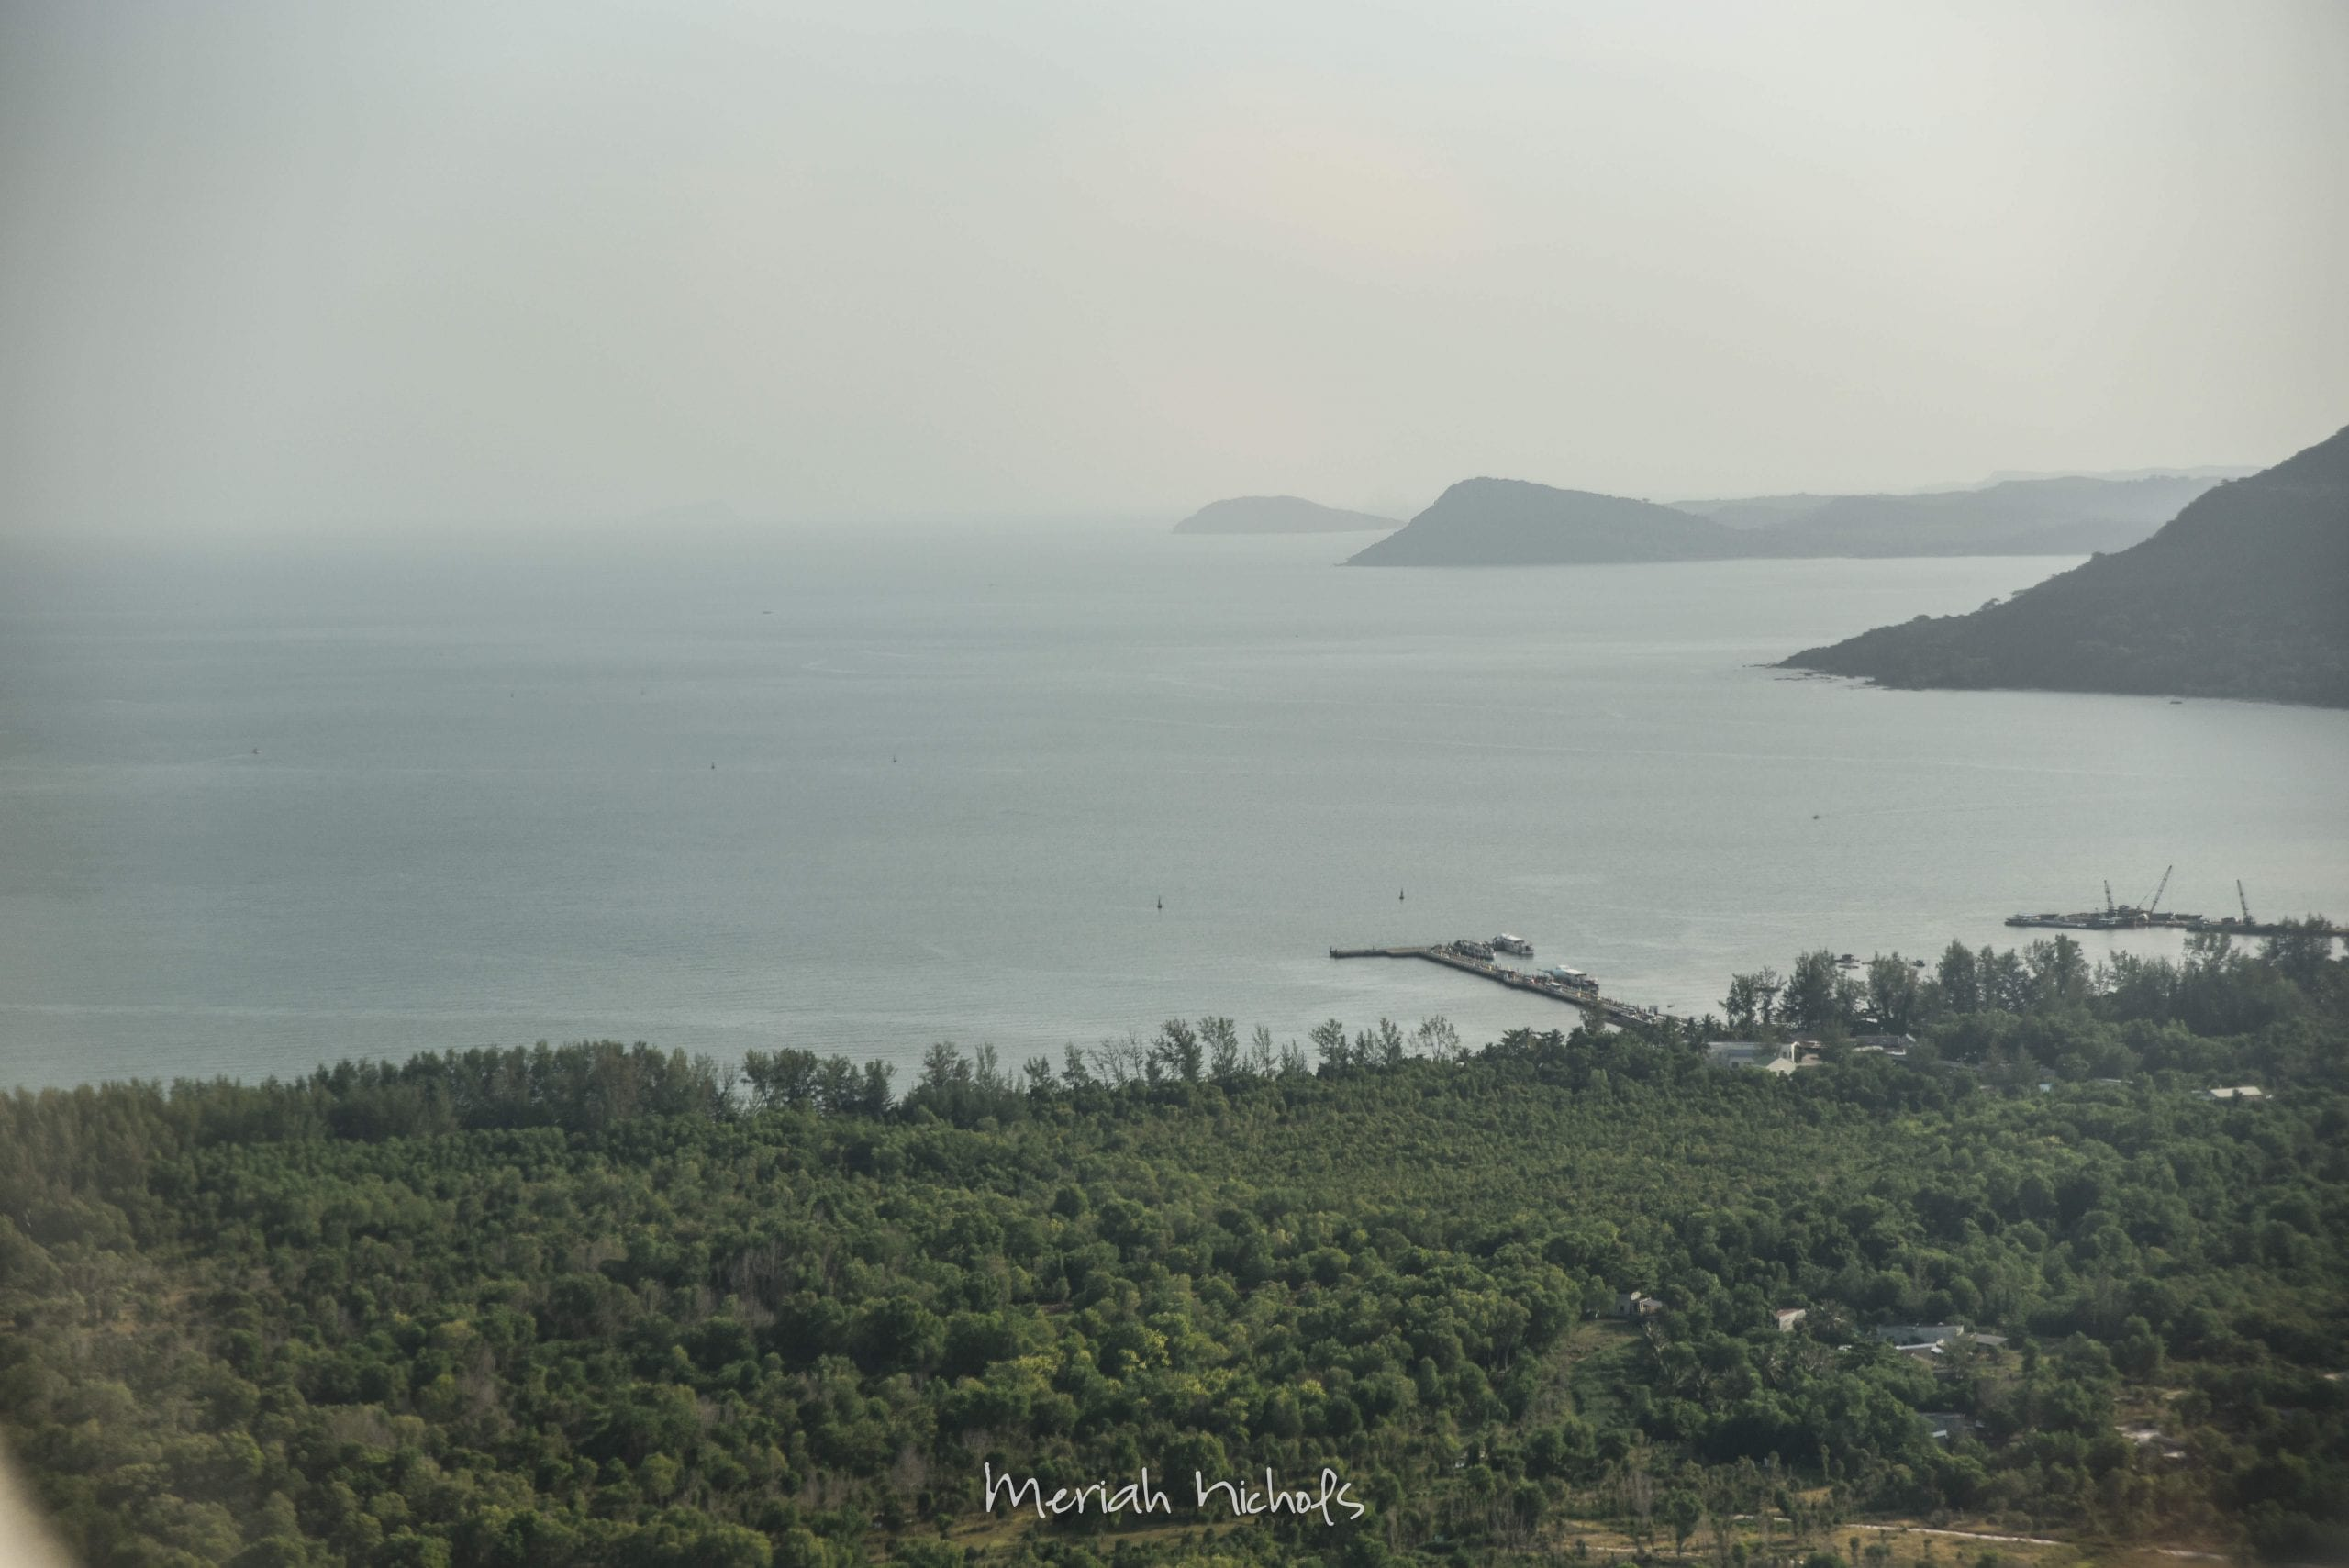 Meriah Nichols Phu Quoc Island Vietnam-2